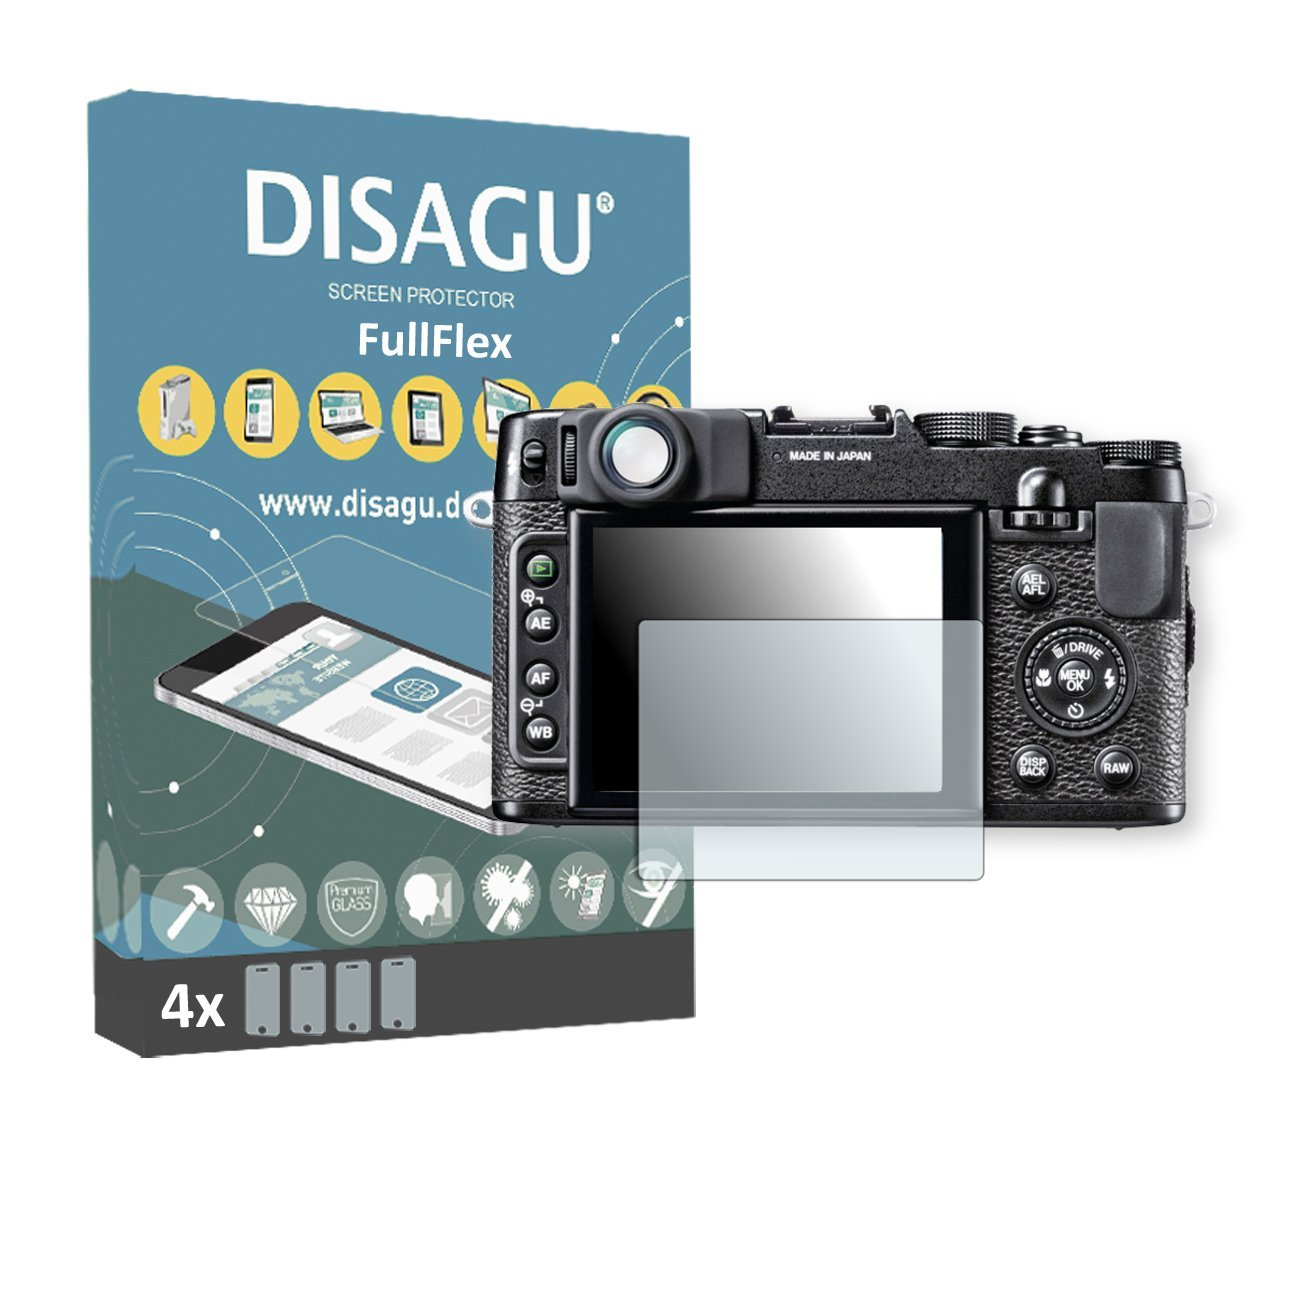 4 x Disagu FullFlex screen protector for Fujifilm X10 foil screen protector